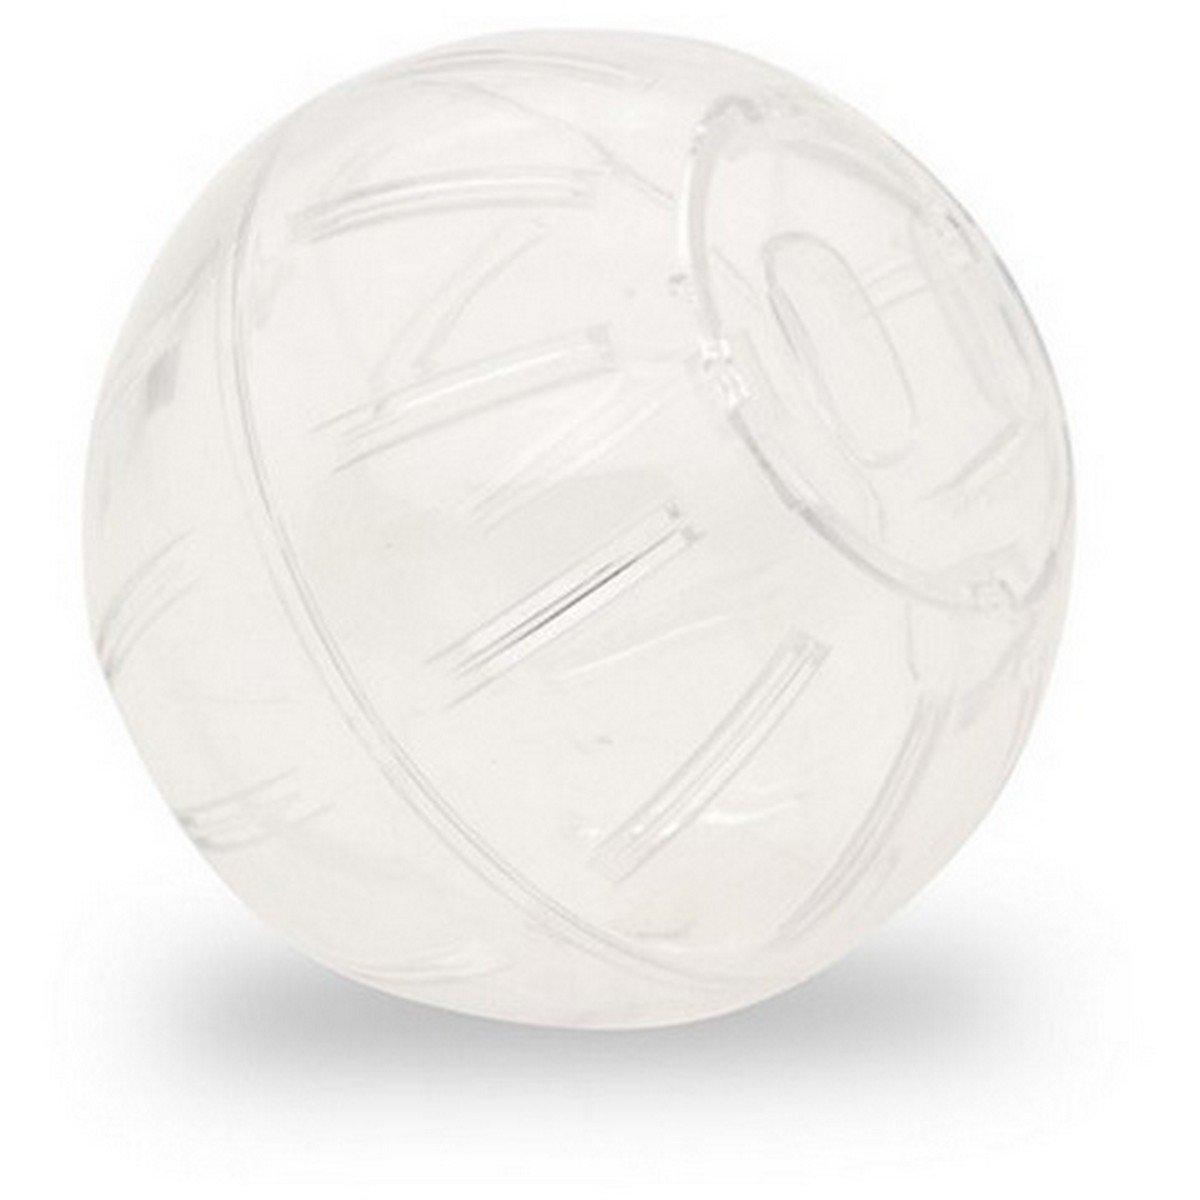 Afbeelding van Crittertra Hamsterbal Premium Transparant 125cm